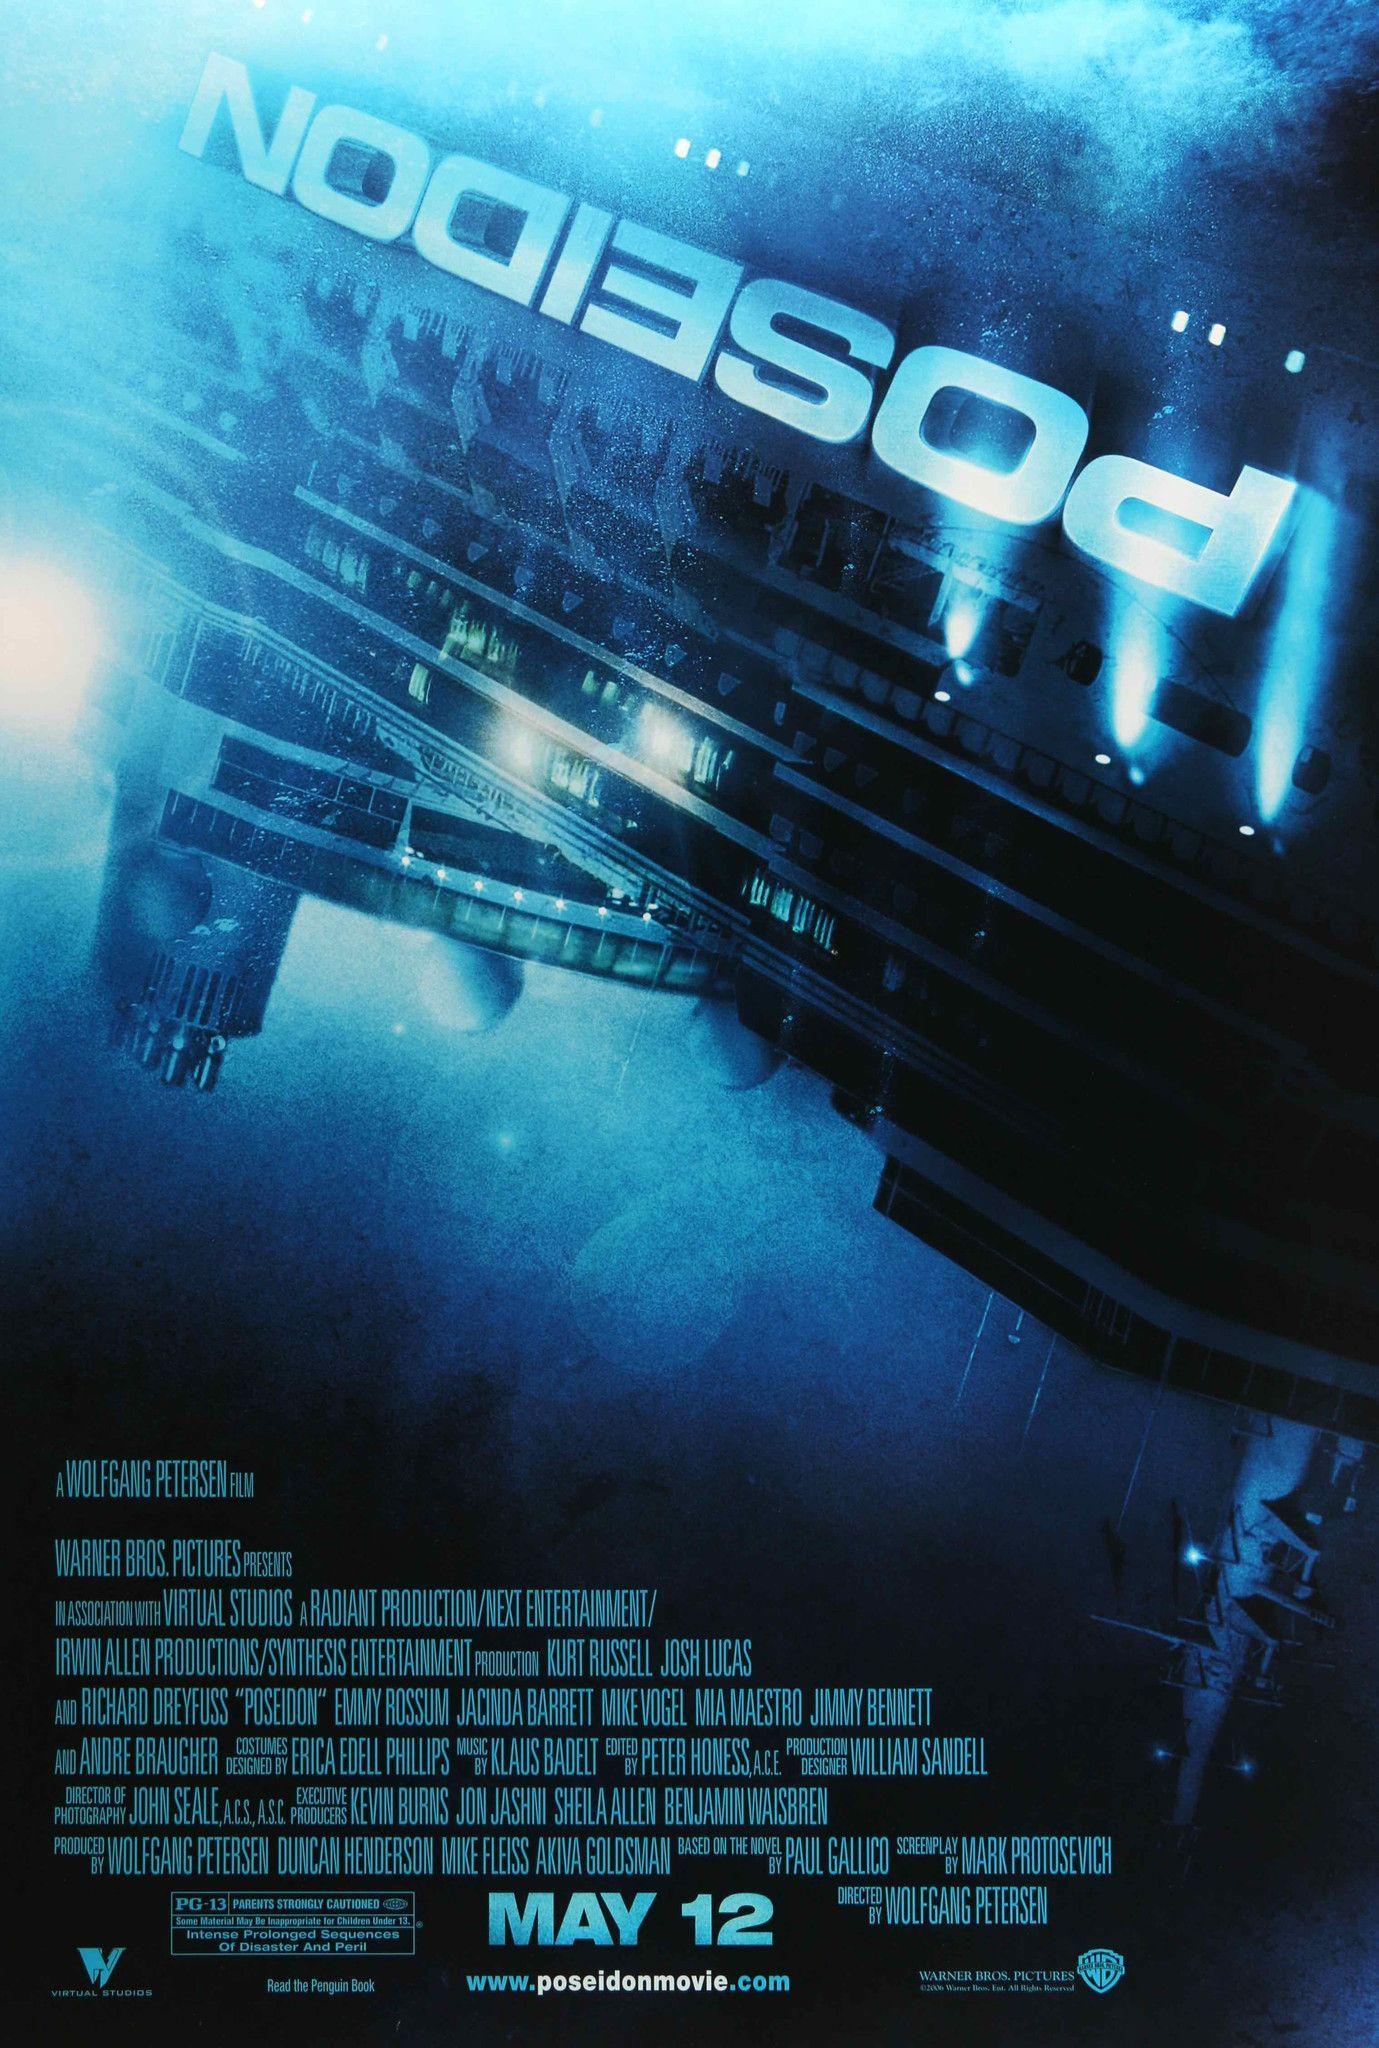 Poseidon 2006 Original Movie Posters At Film Art Short Circuit 27x40 Poster 1986 Vintage 27 X 40